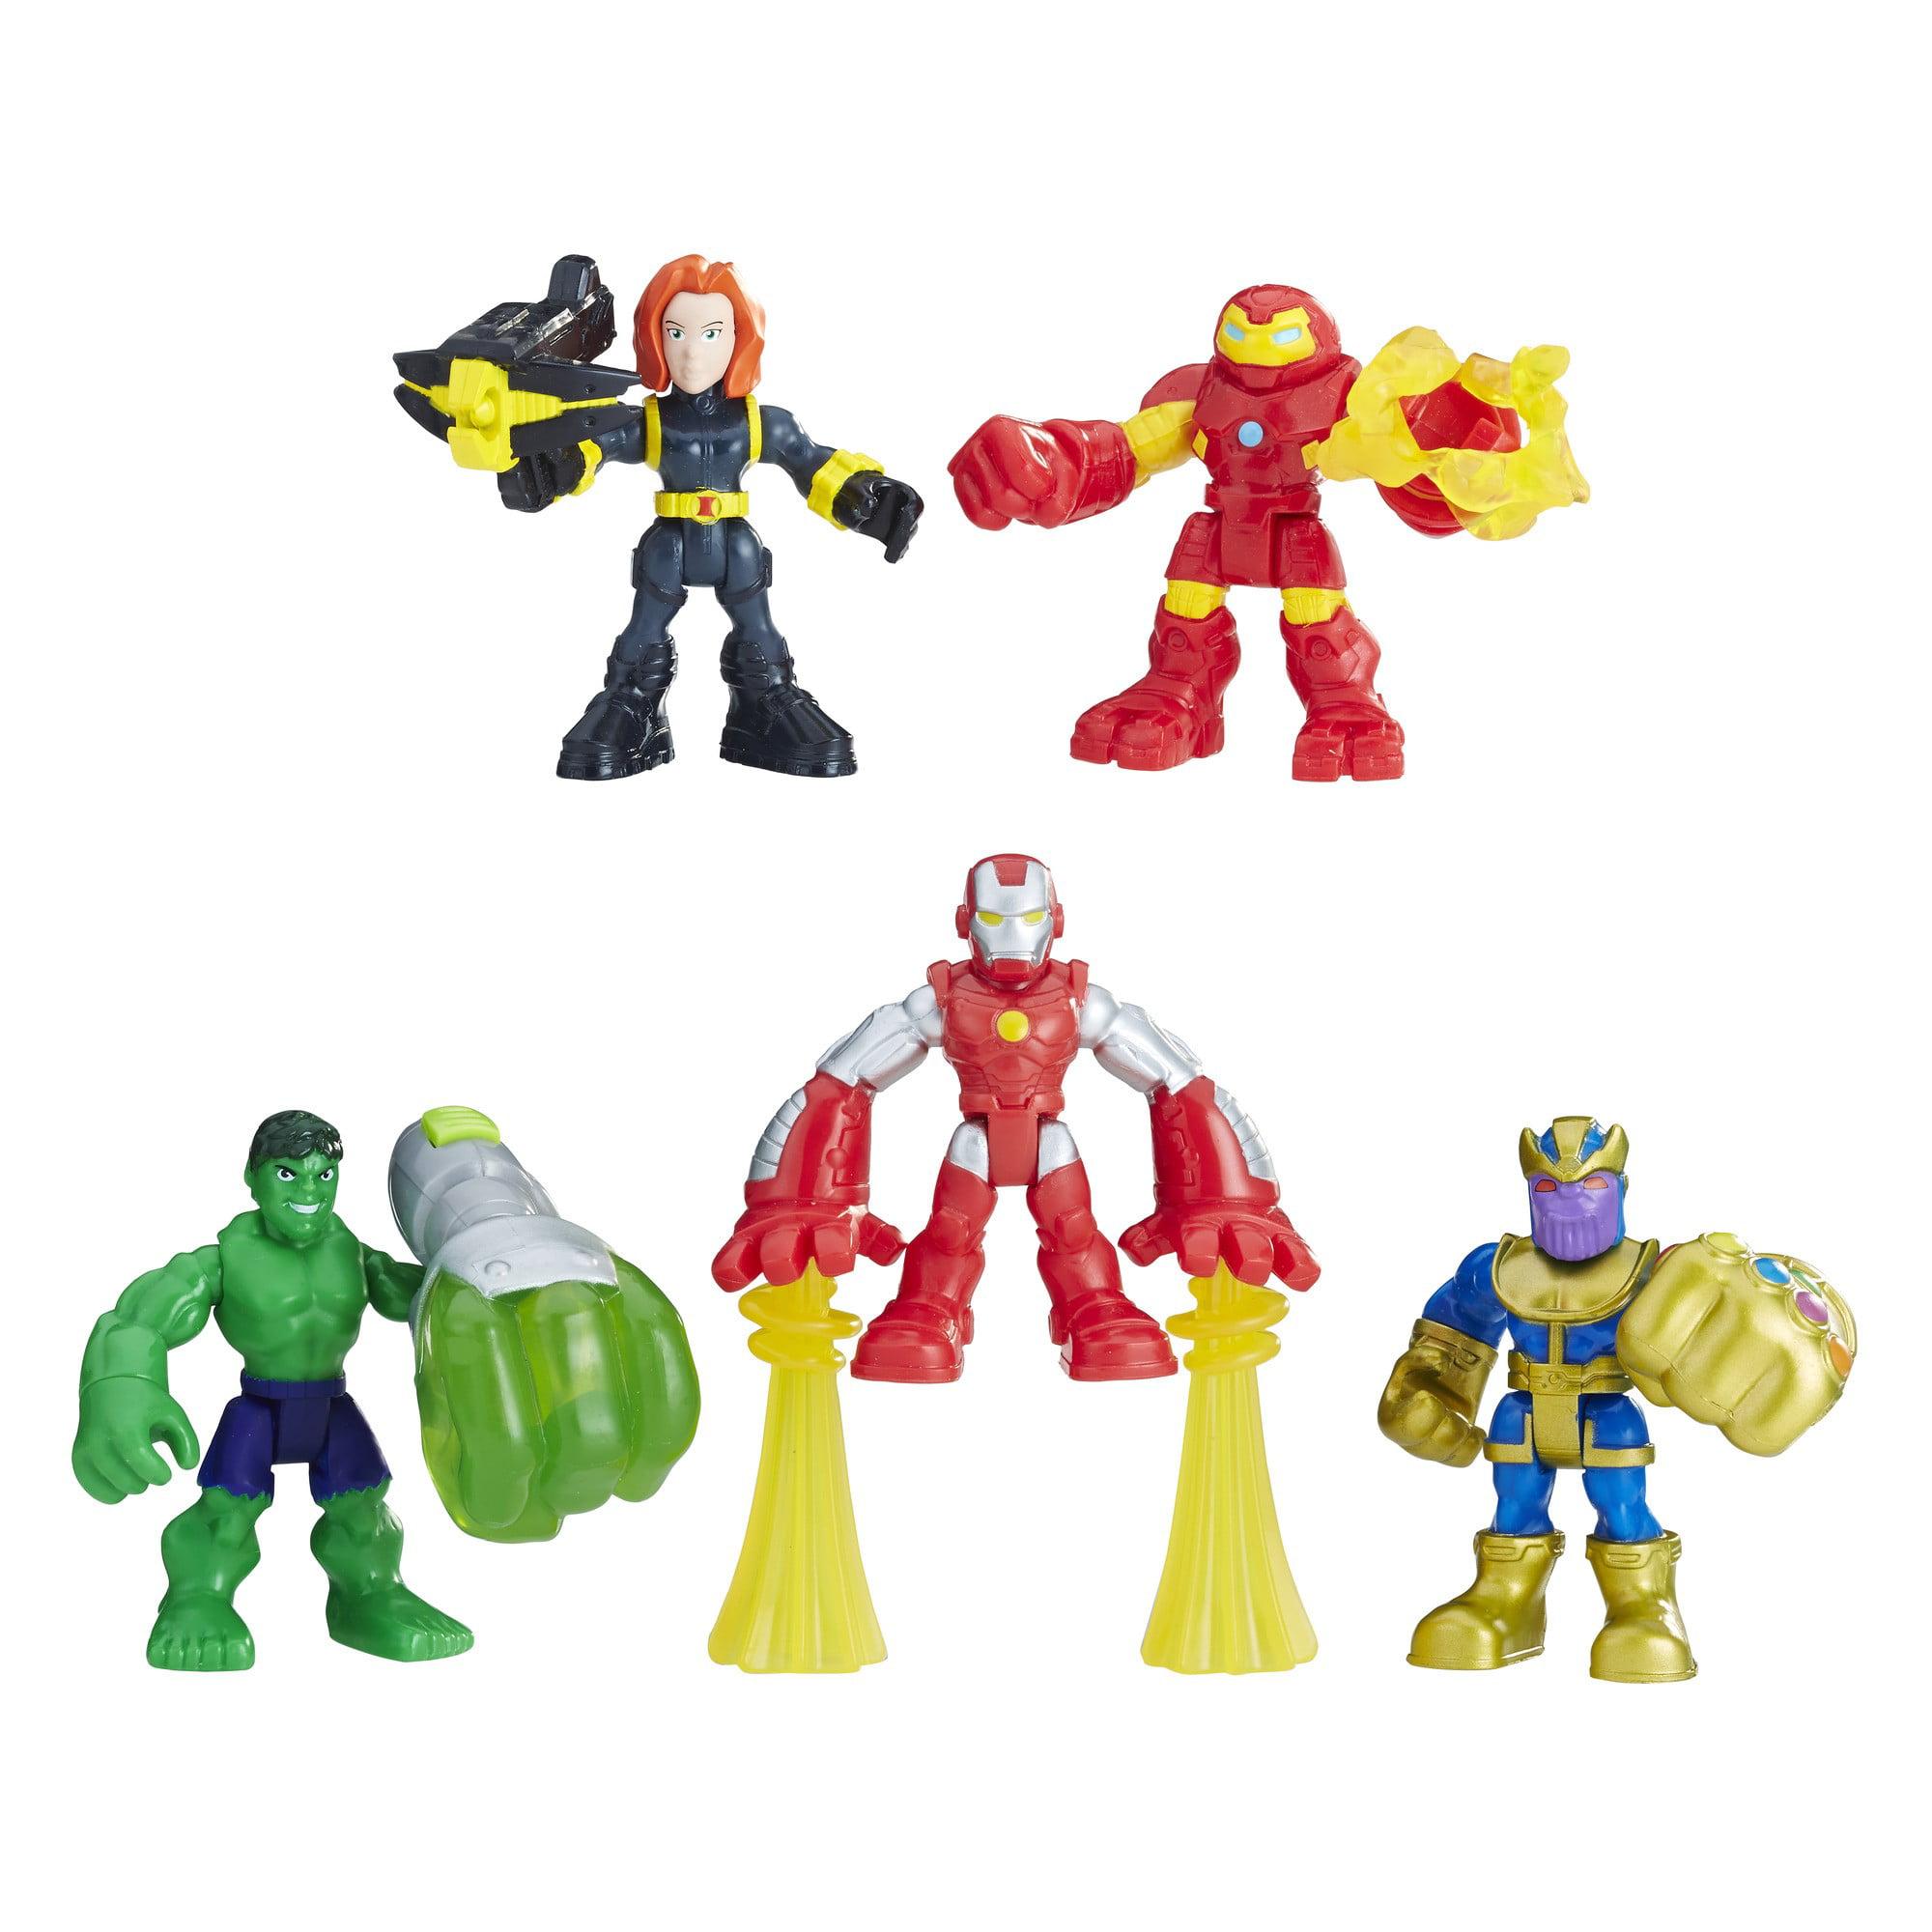 Playskool Héros Marvel Super Hero Adventures Hulk 5-inch Action Figure